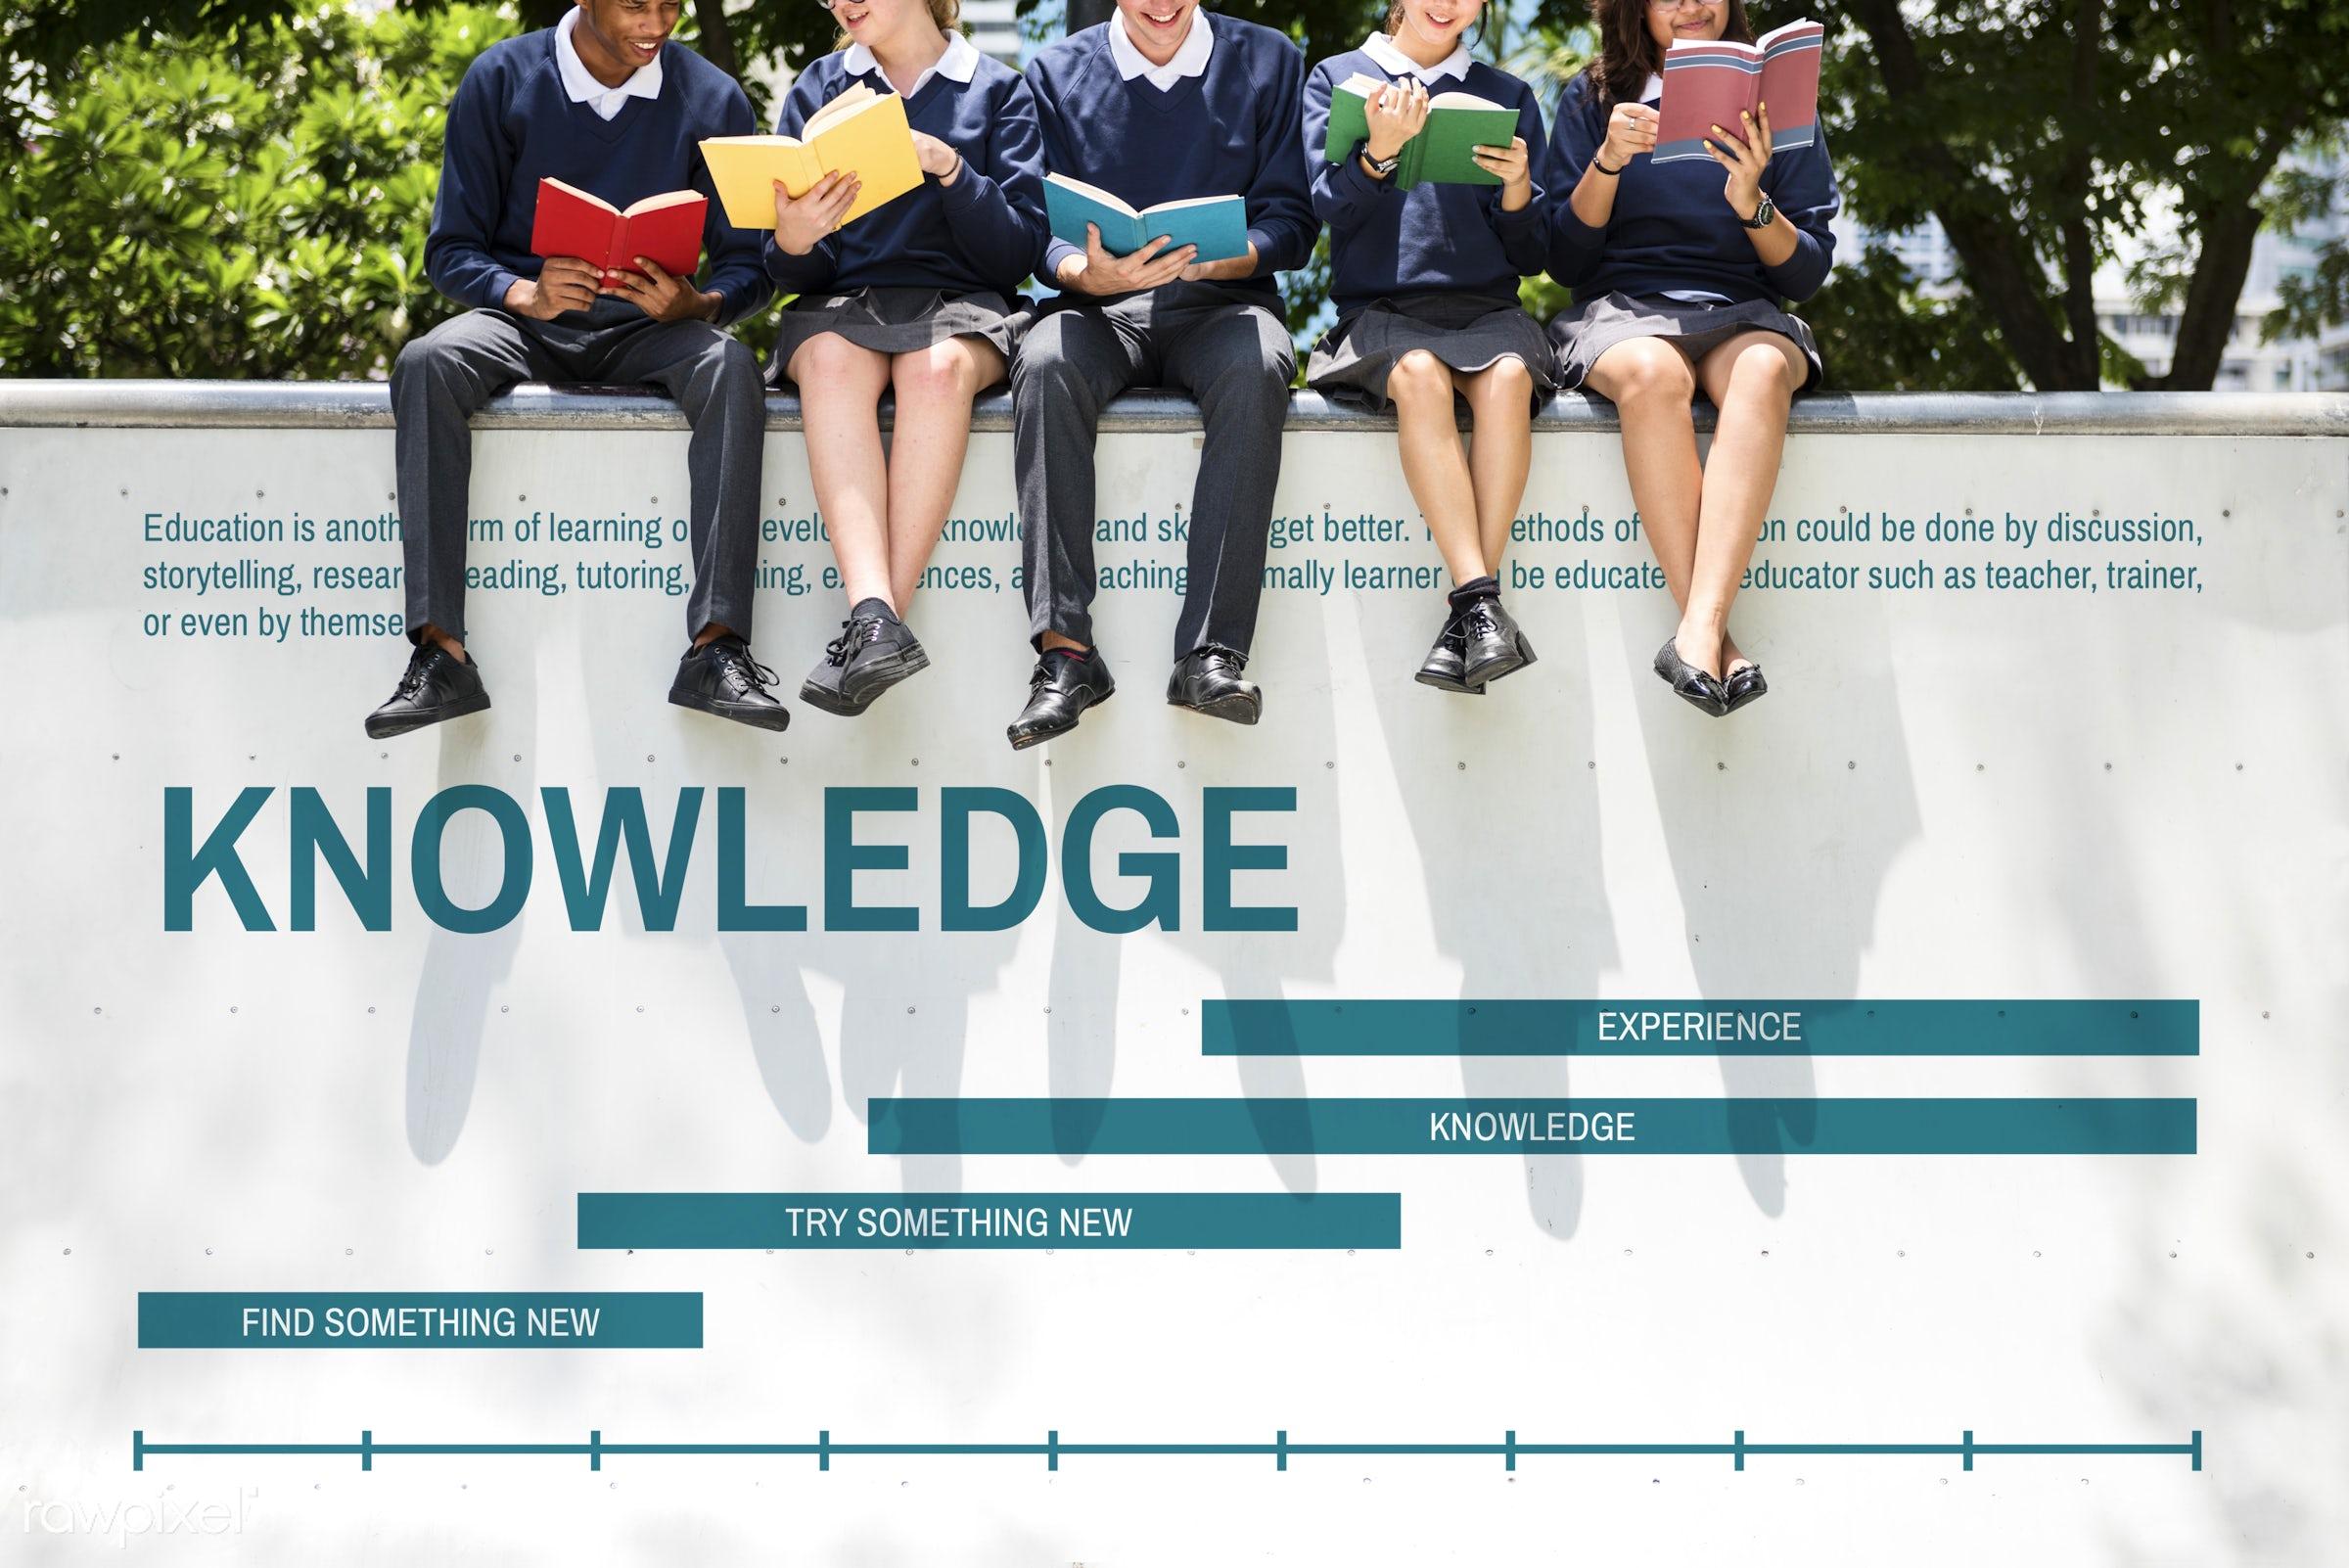 academics, books, class, college, communication, degree, development, diversity, education, experience, friends, friendship...